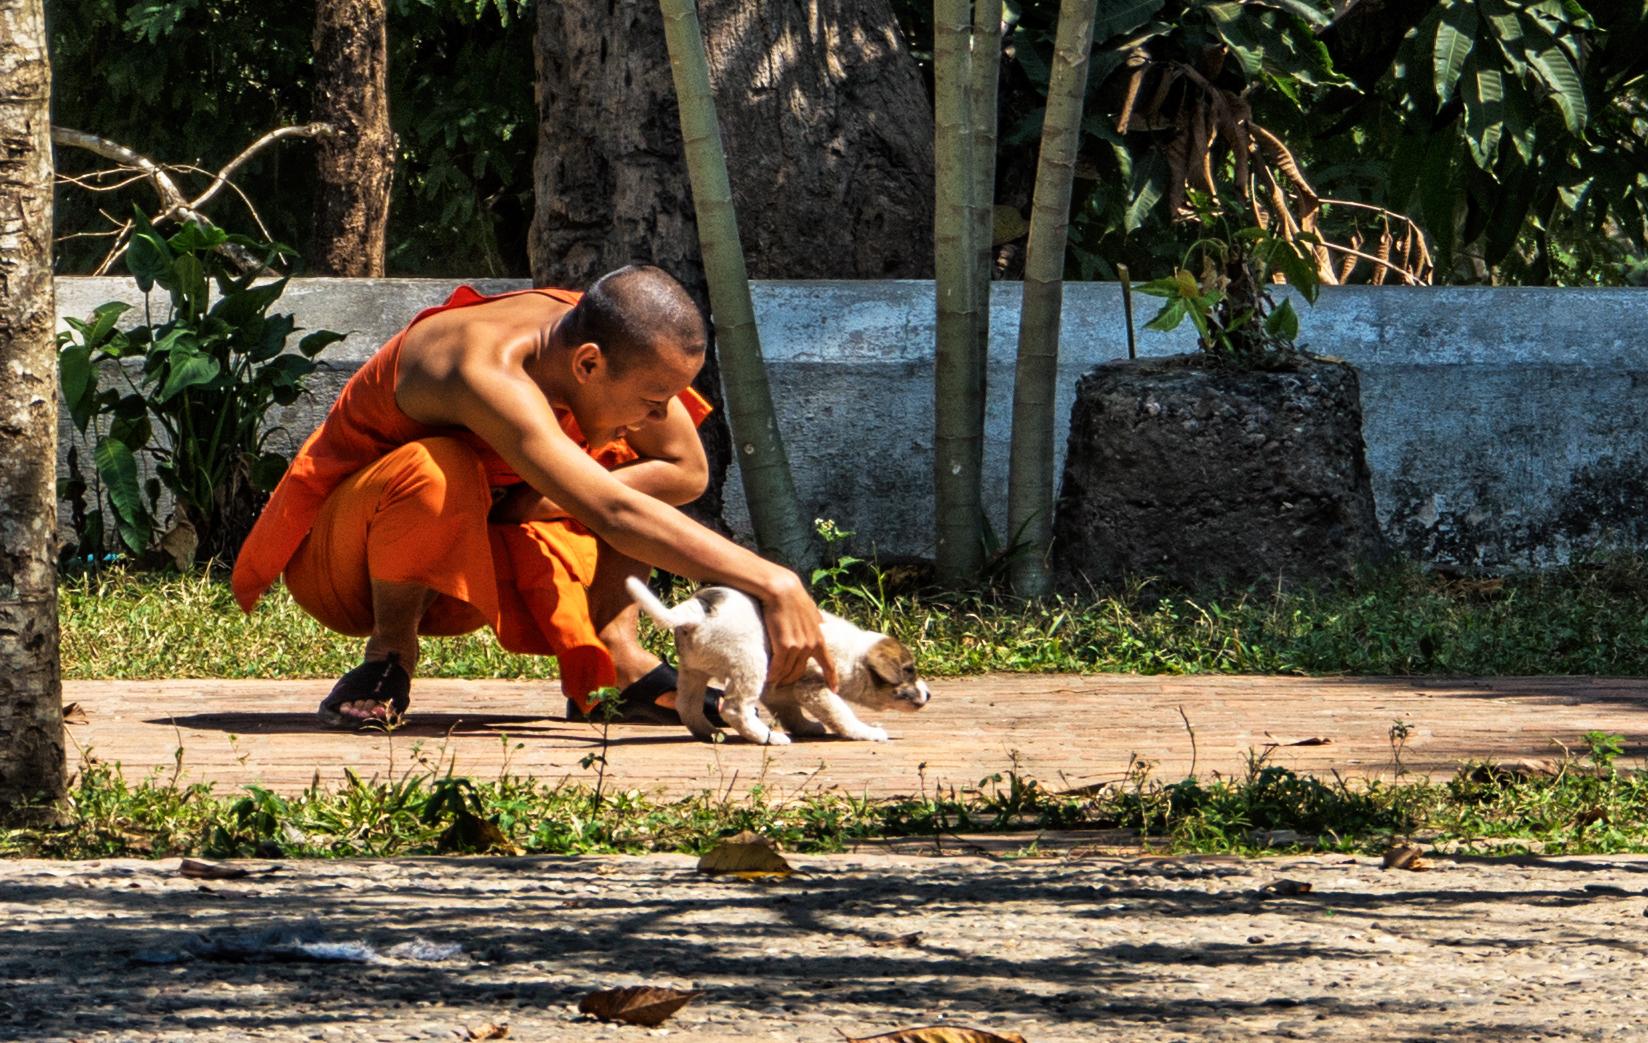 Laos – Gioco al Tempio